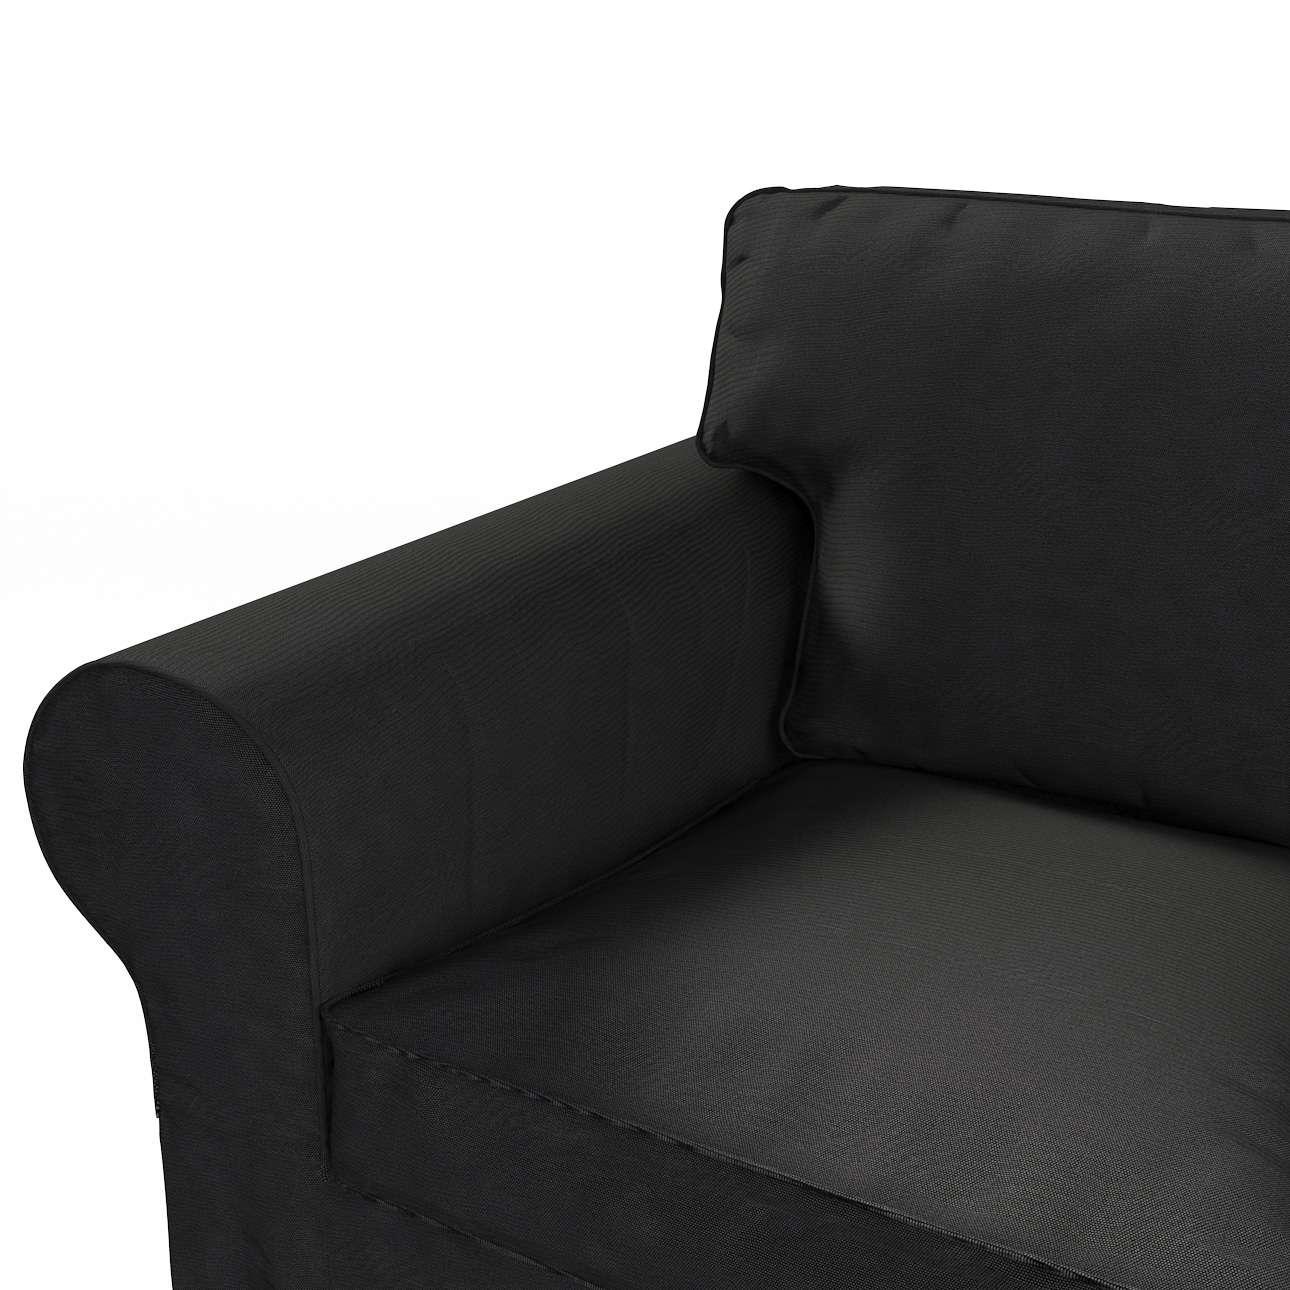 Ektorp 3-Sitzer Schlafsofabezug neues Modell (2013) Ektorp 3-Sitzer, ausklappbar, neues Modell ( 2013) von der Kollektion Etna, Stoff: 705-00